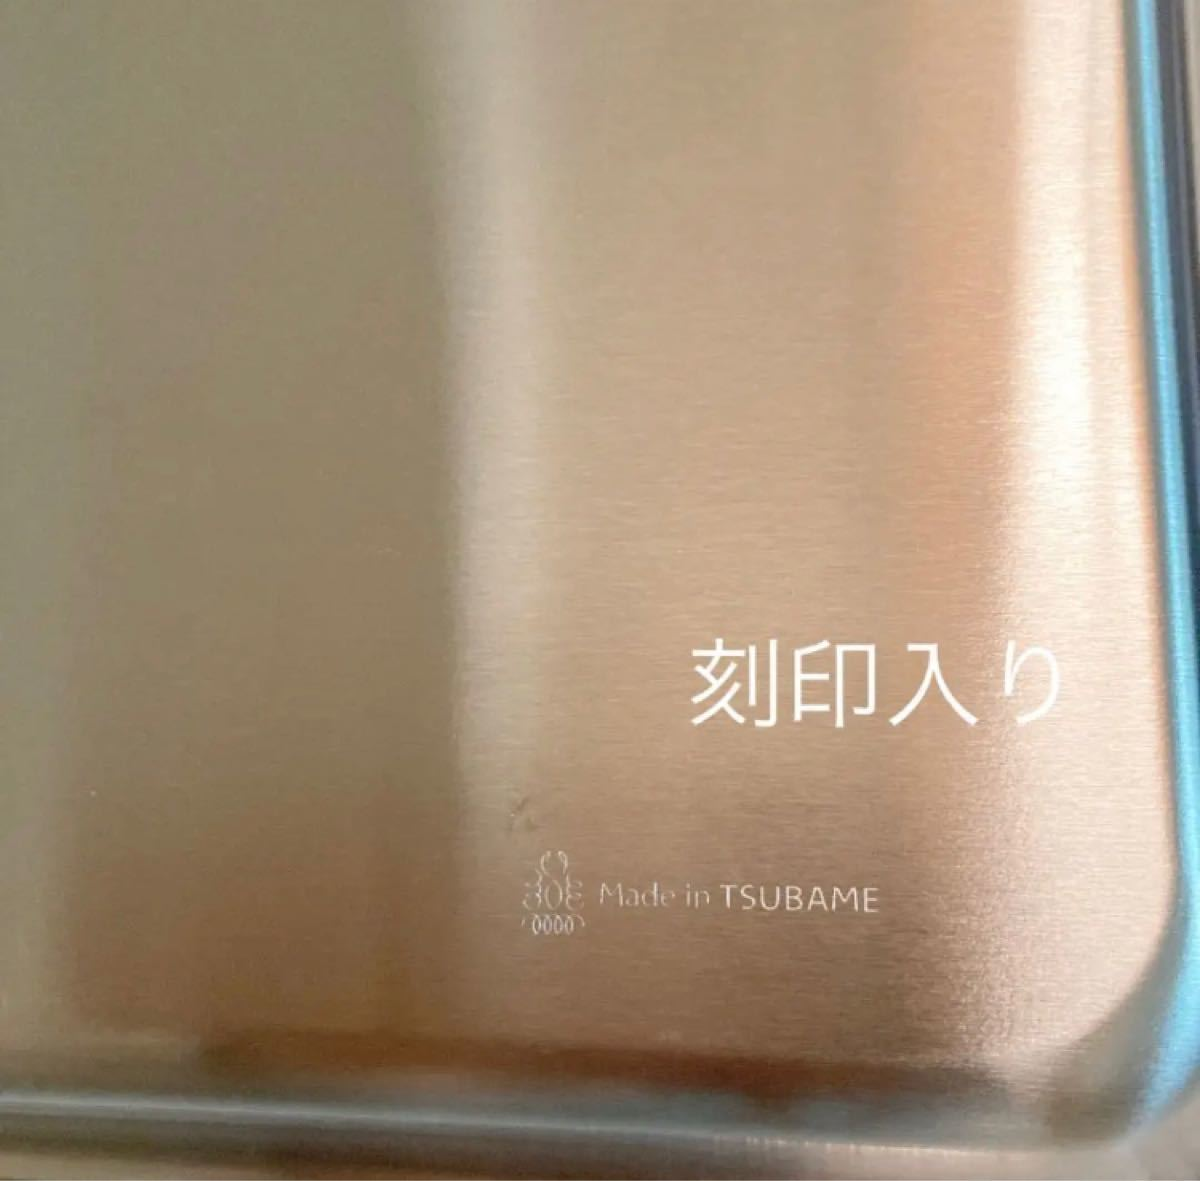 MADE in TSUBAME 深型ステンレスバット 2枚セット 新品 下ごしらえ・衣付けに 日本製 新潟県燕市燕三条 刻印入り